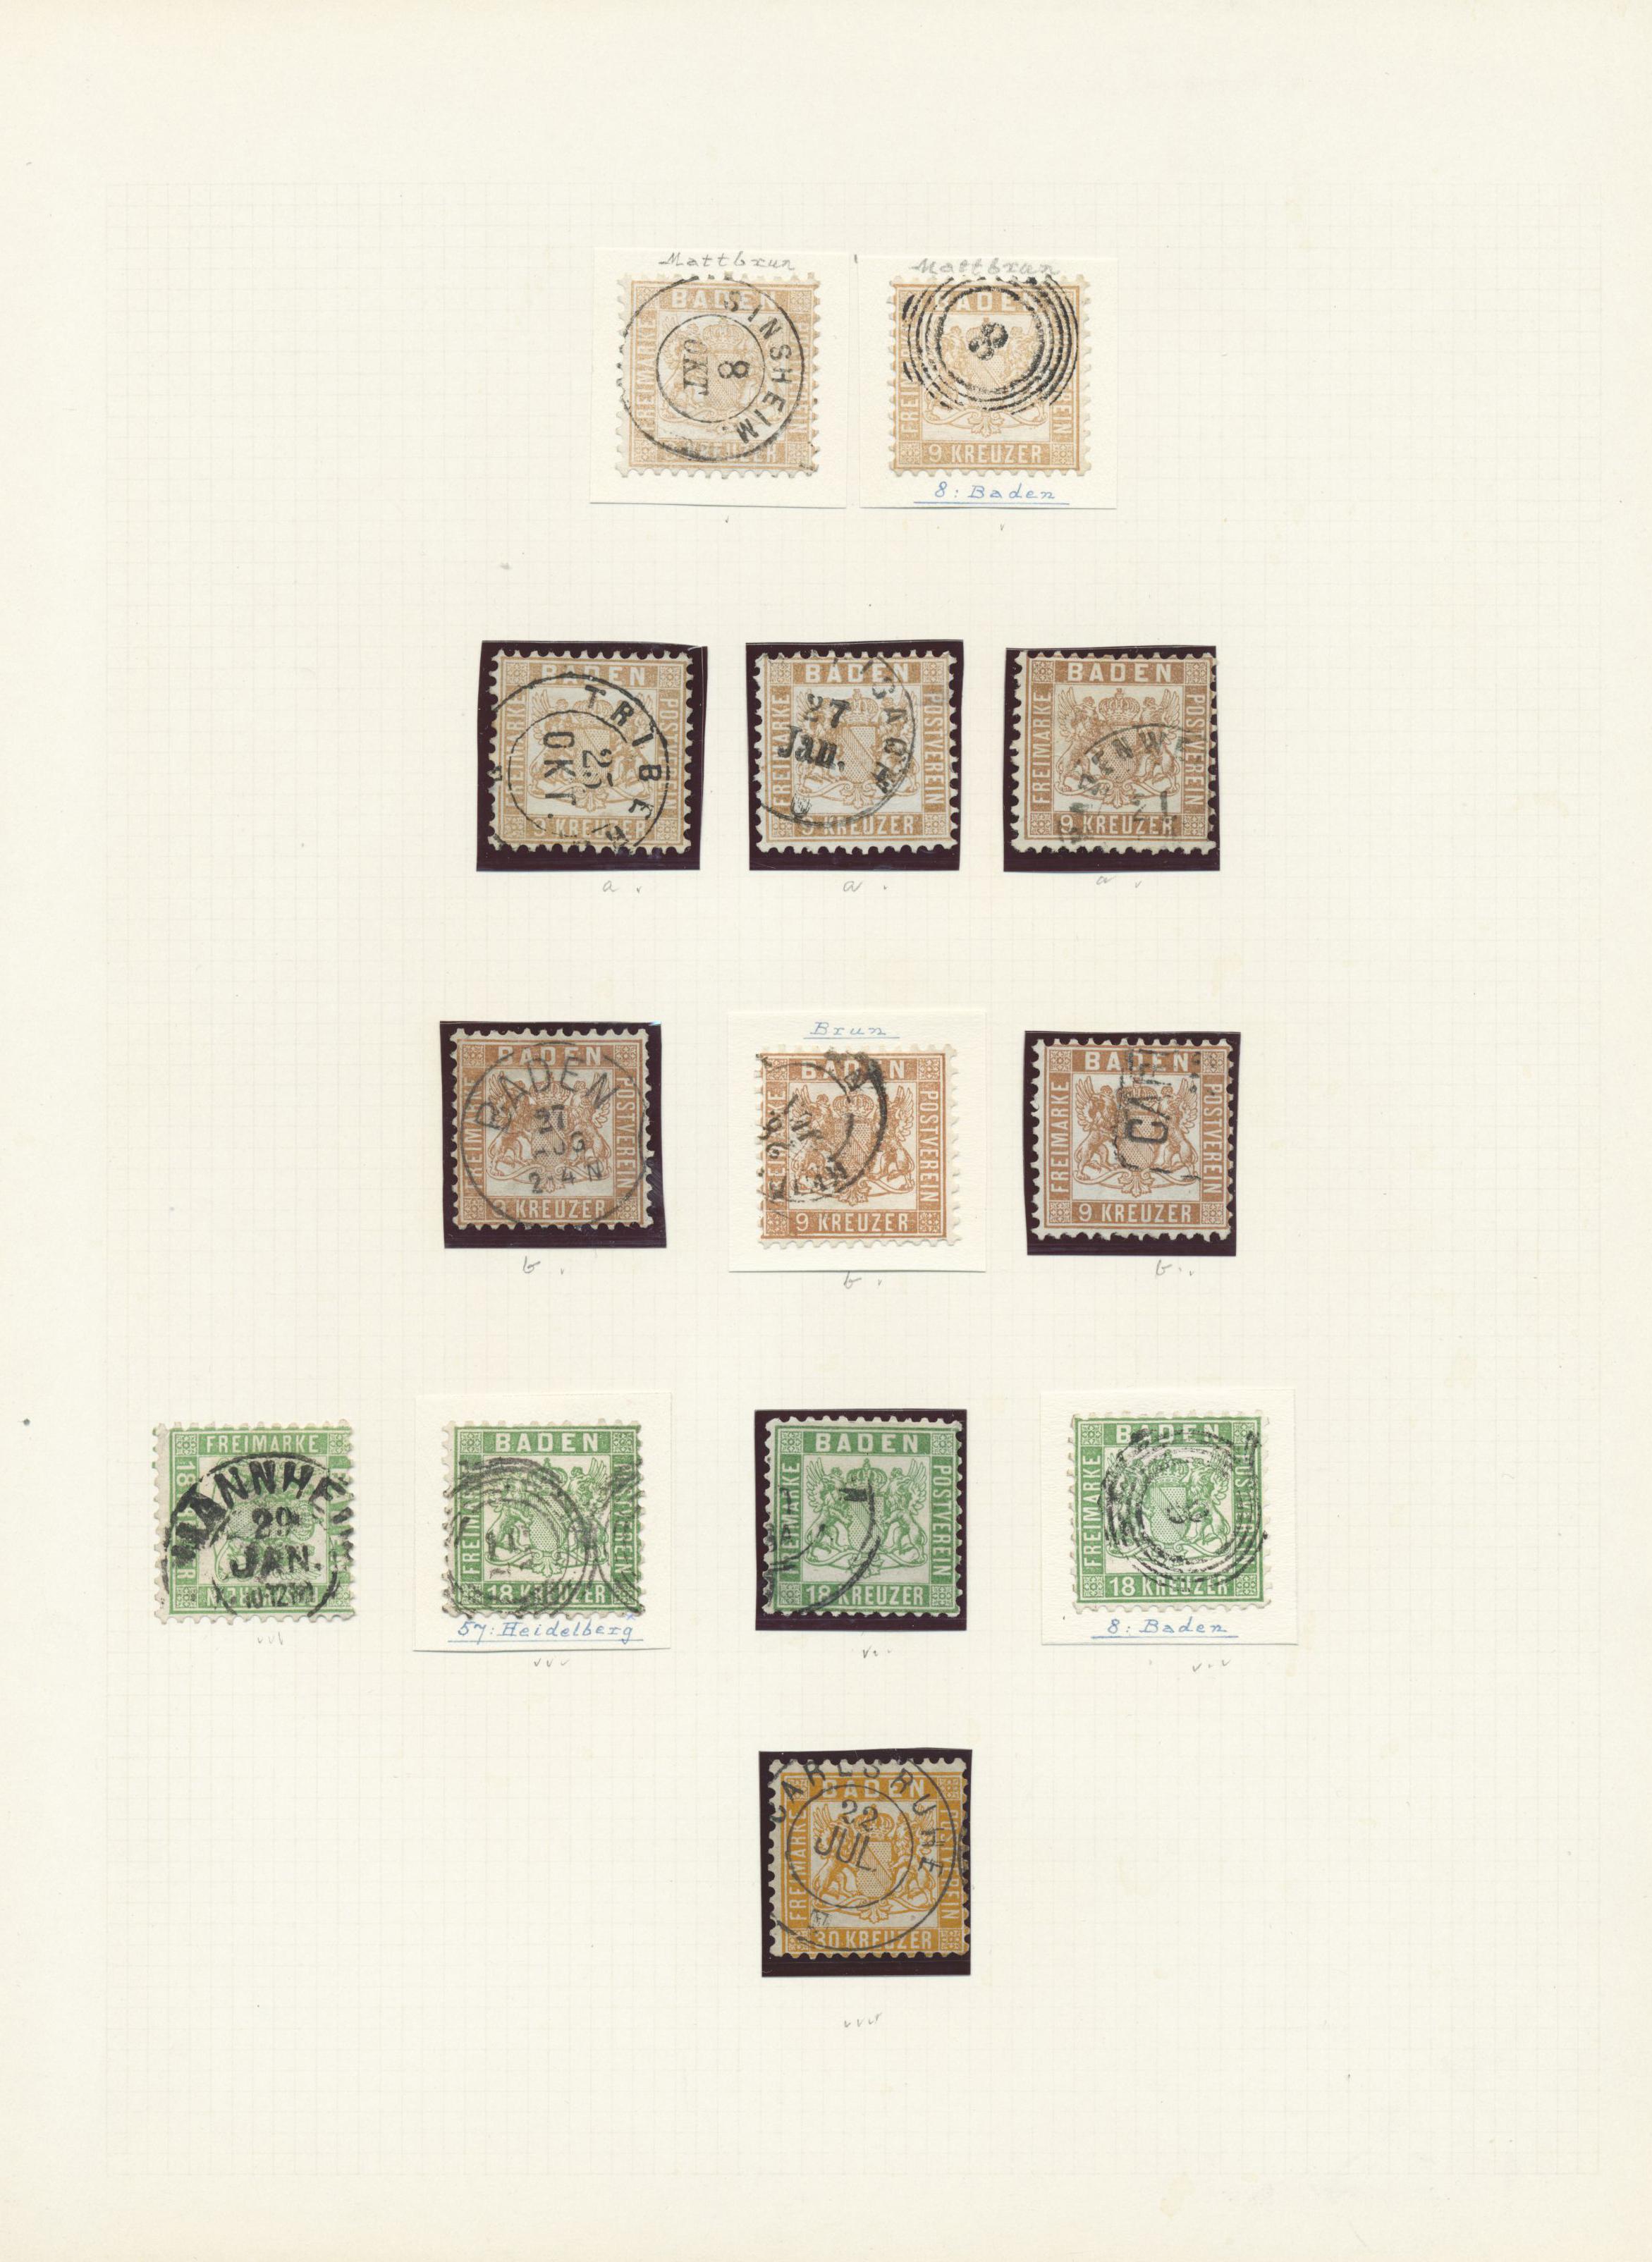 Lot 24252 - Baden - Marken und Briefe  -  Auktionshaus Christoph Gärtner GmbH & Co. KG Sale #47 Colections: Germany